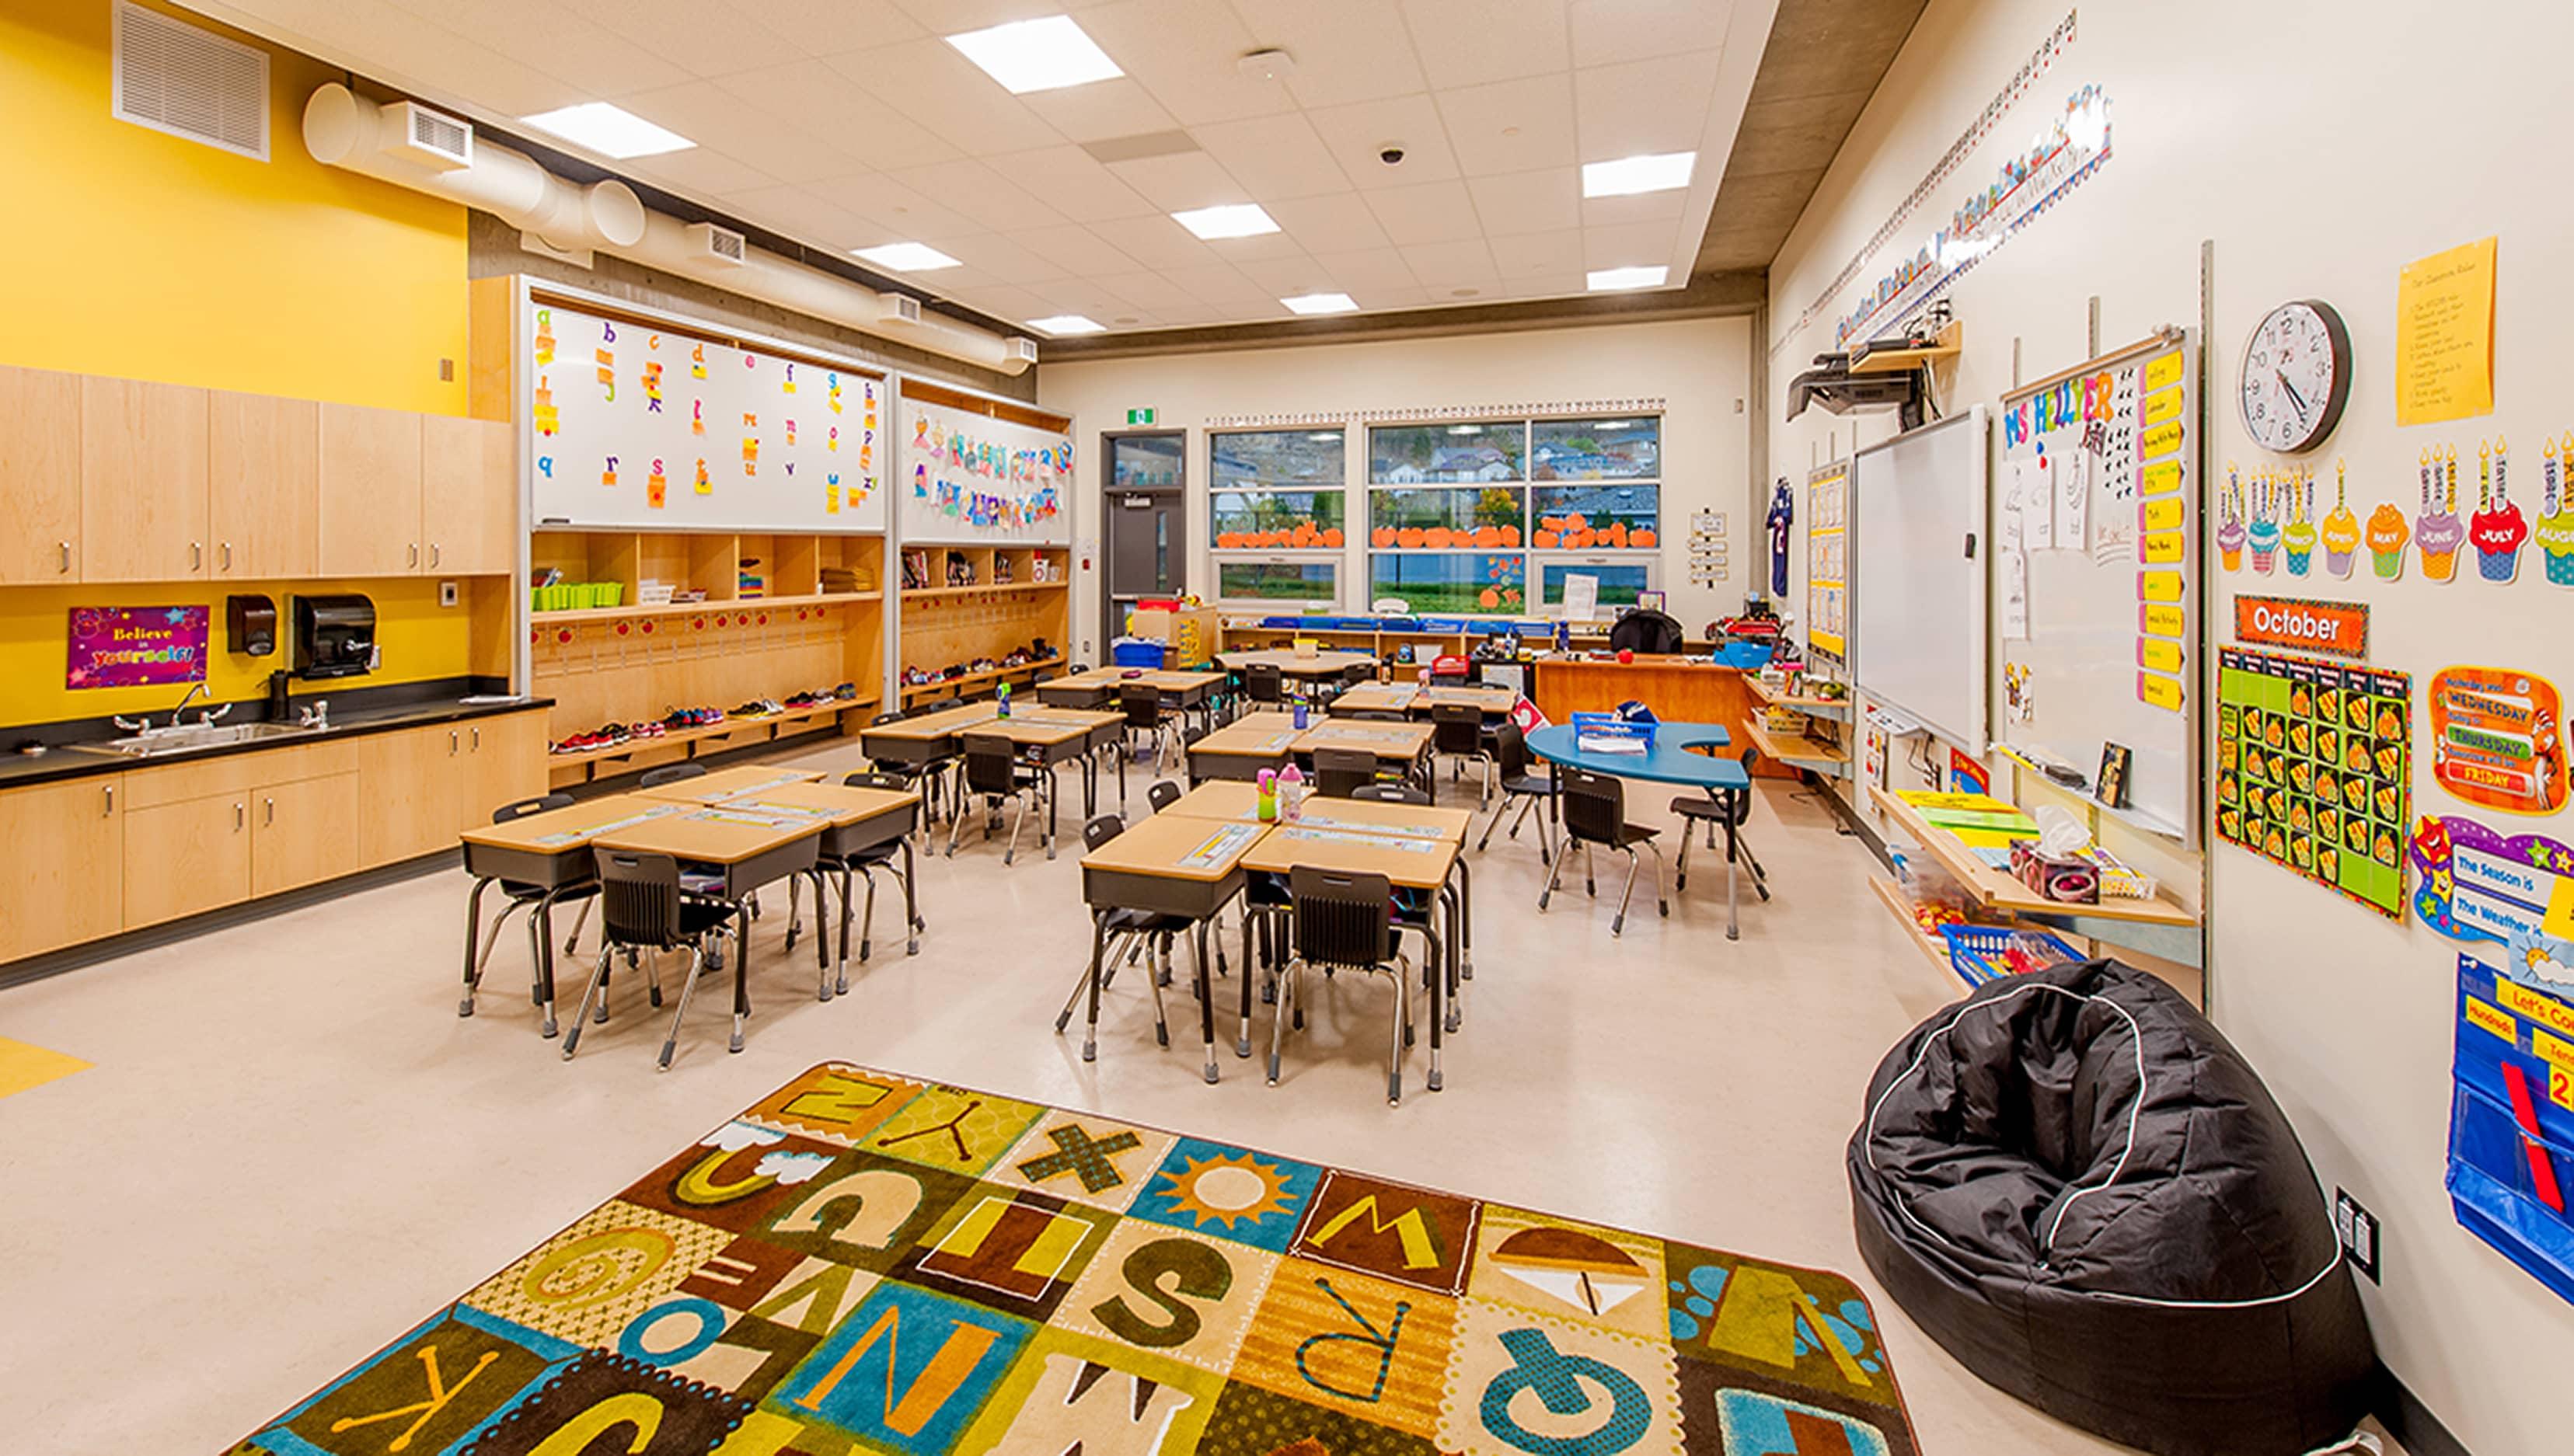 bbp mar jok elementary classroom